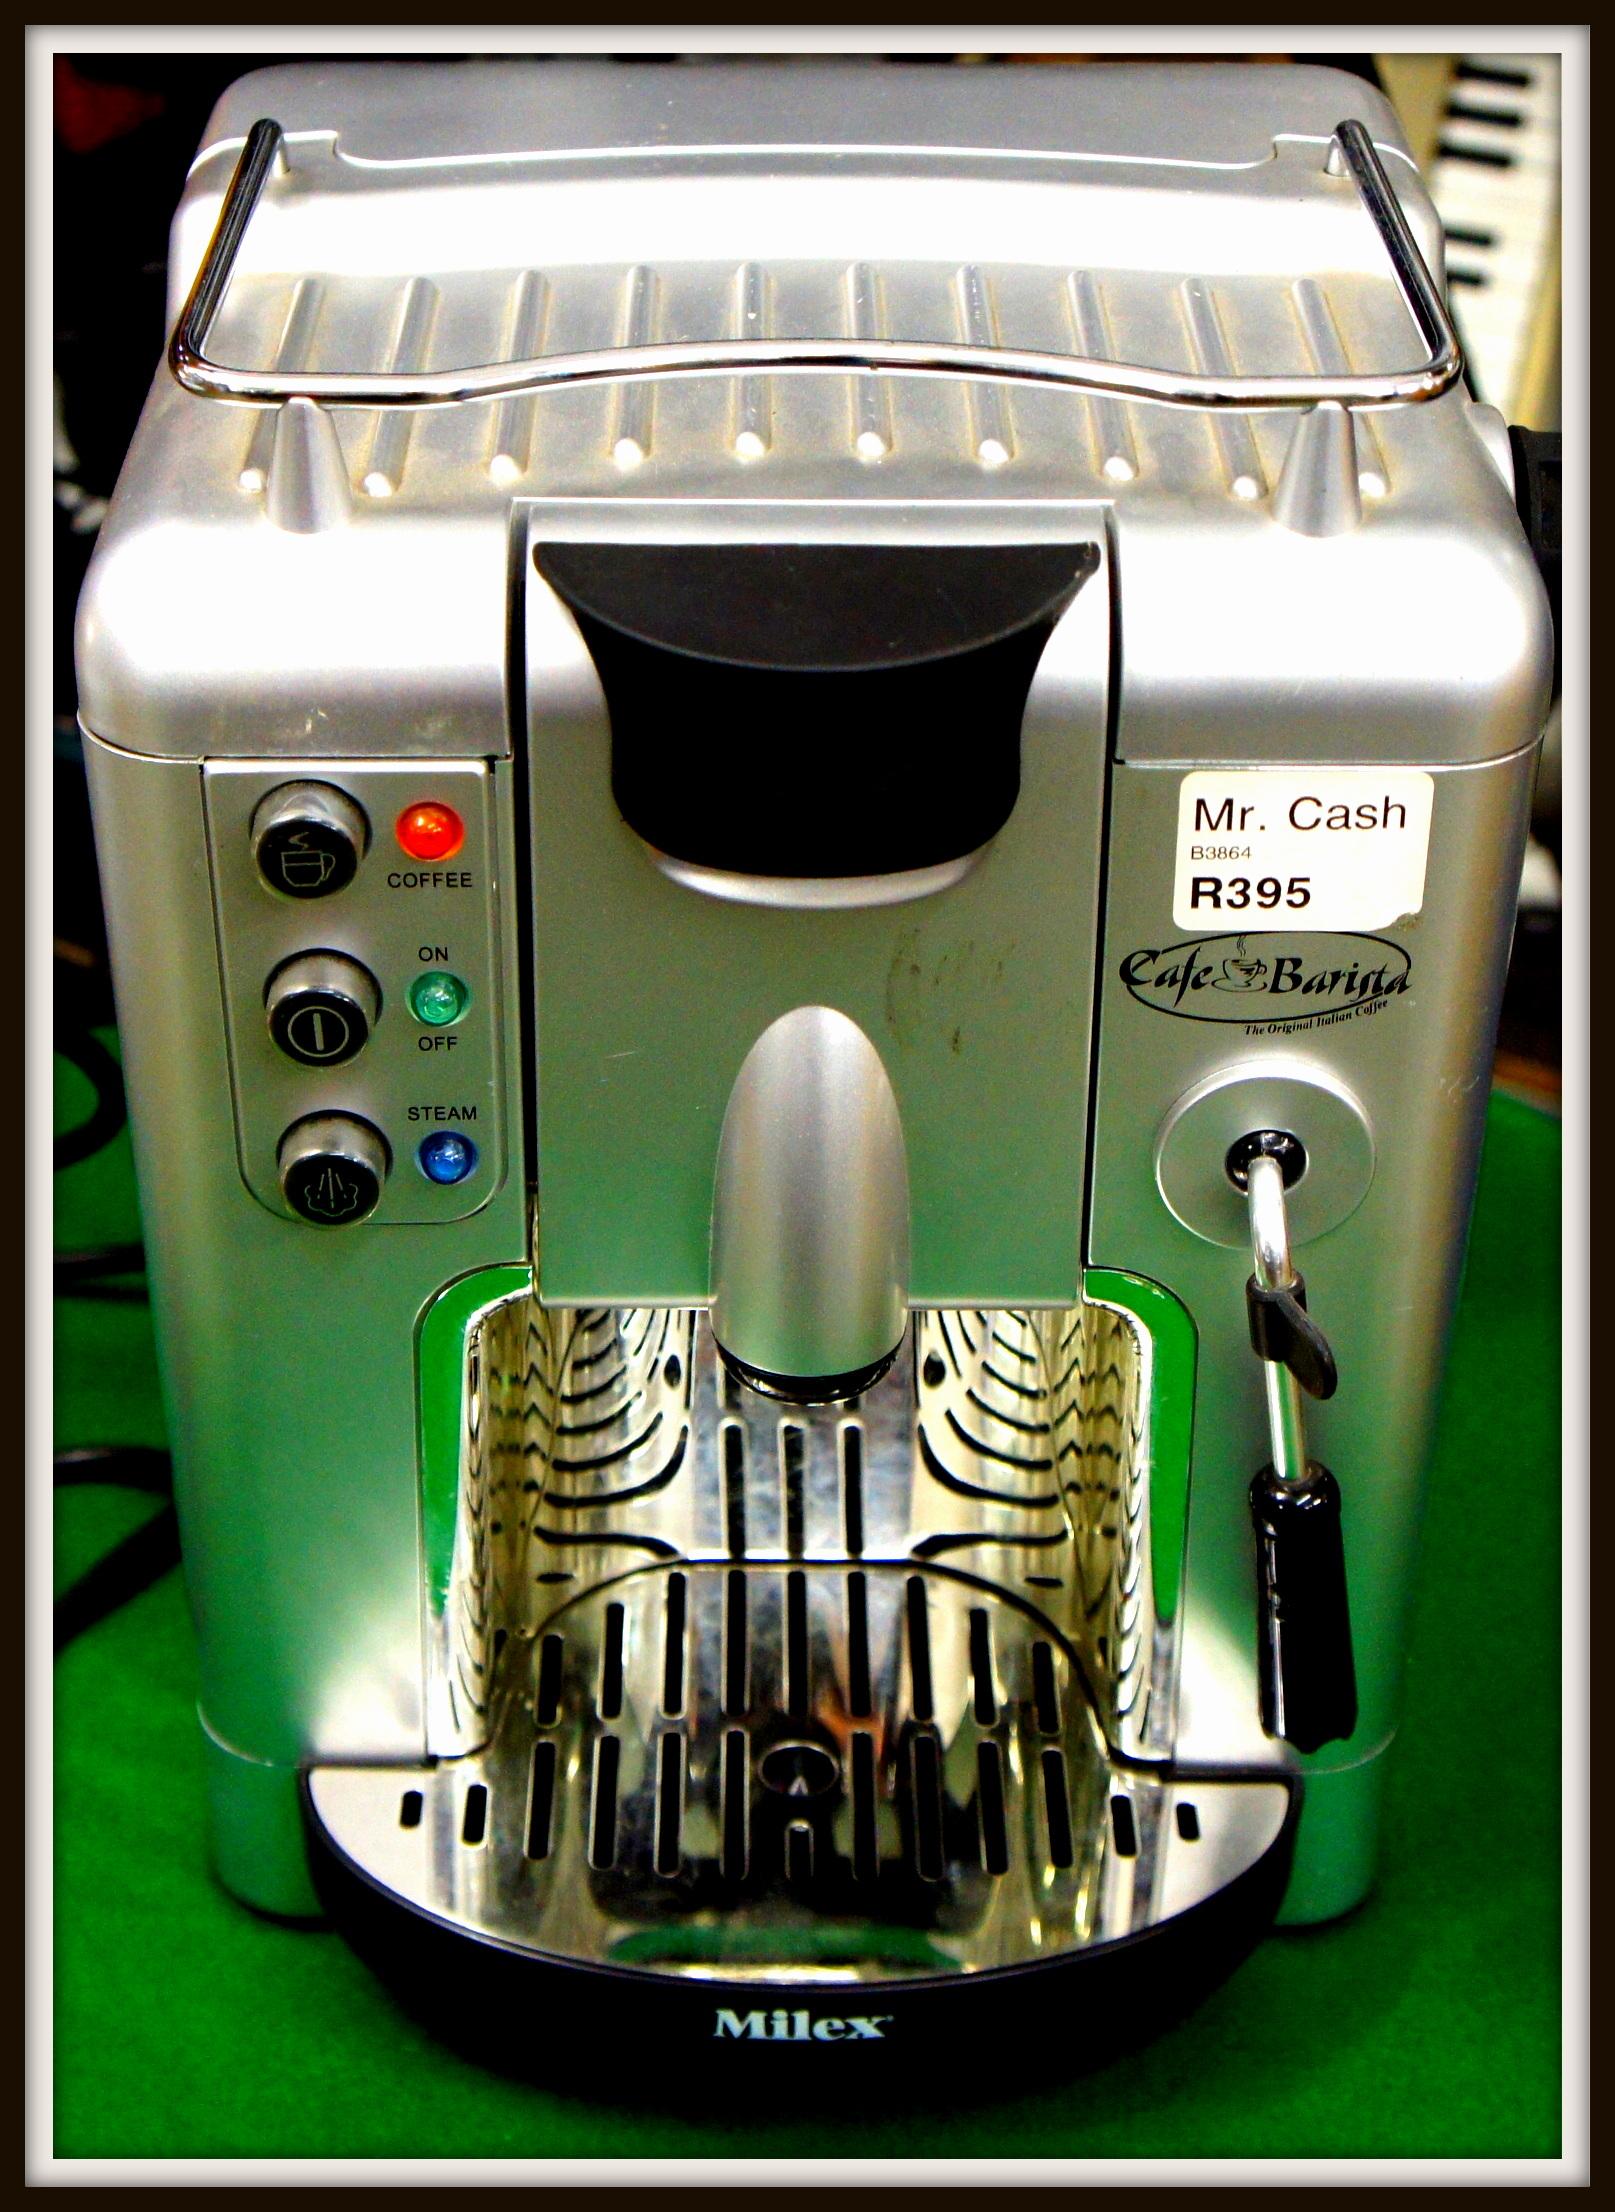 cafe barista R395